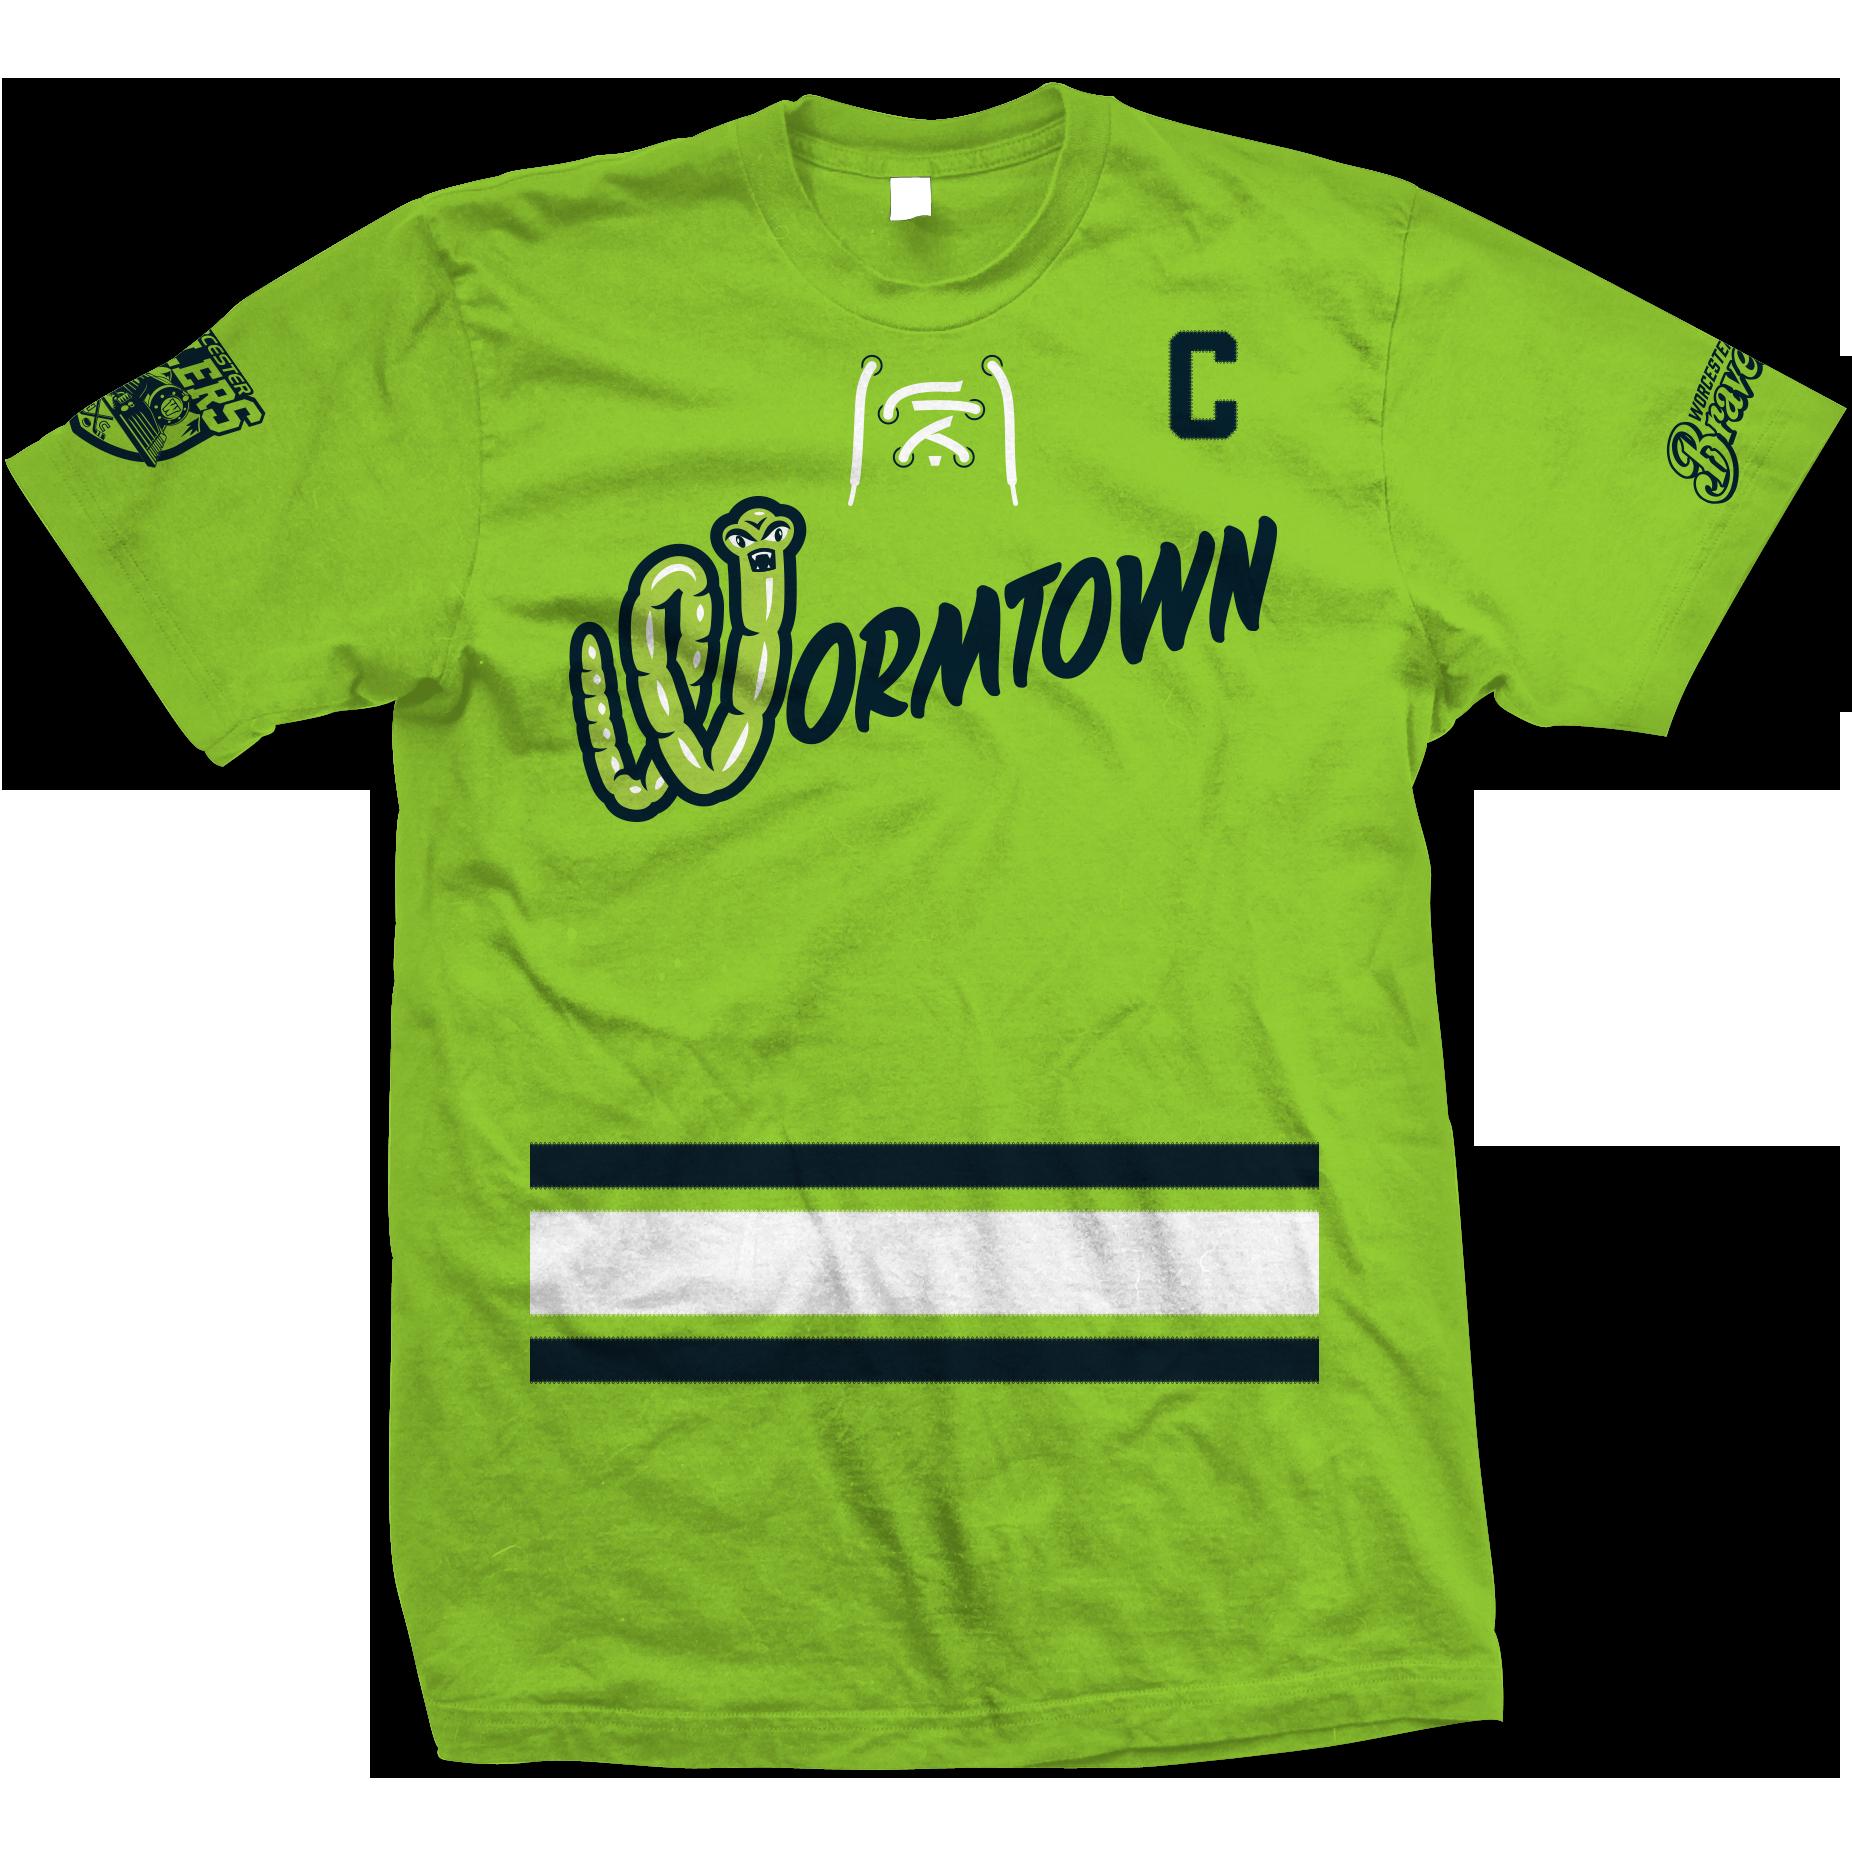 WB_Shirt_Hockey_Night_03.png